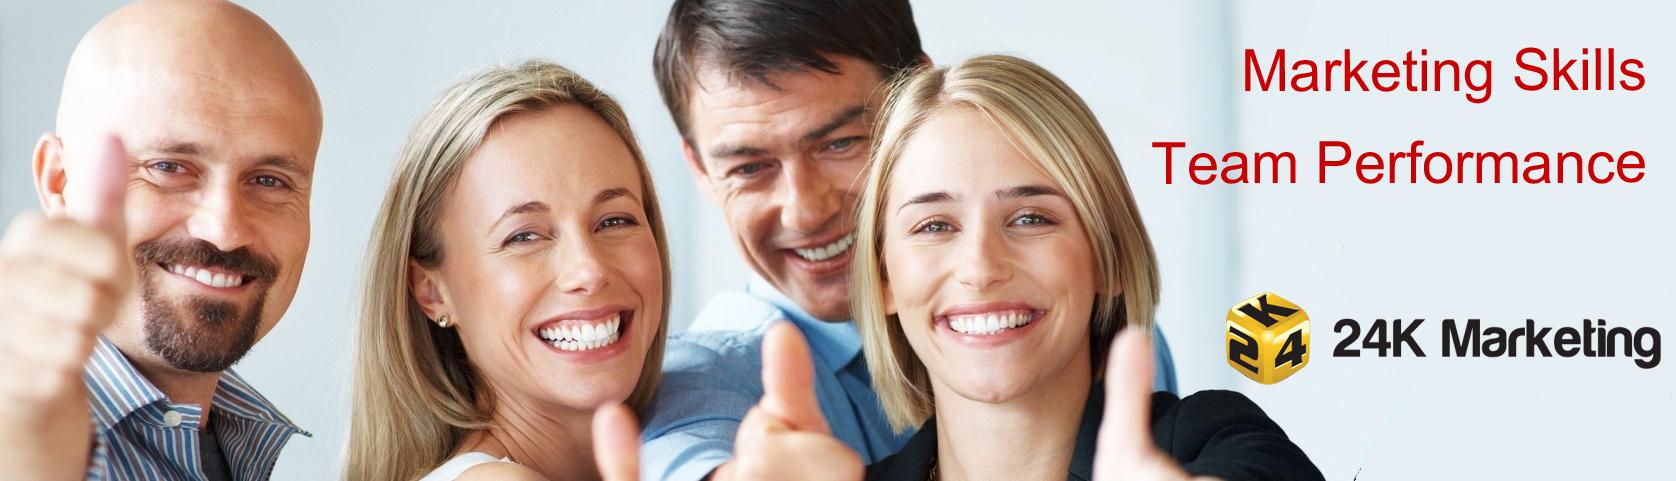 Marketing Training and Team Performance